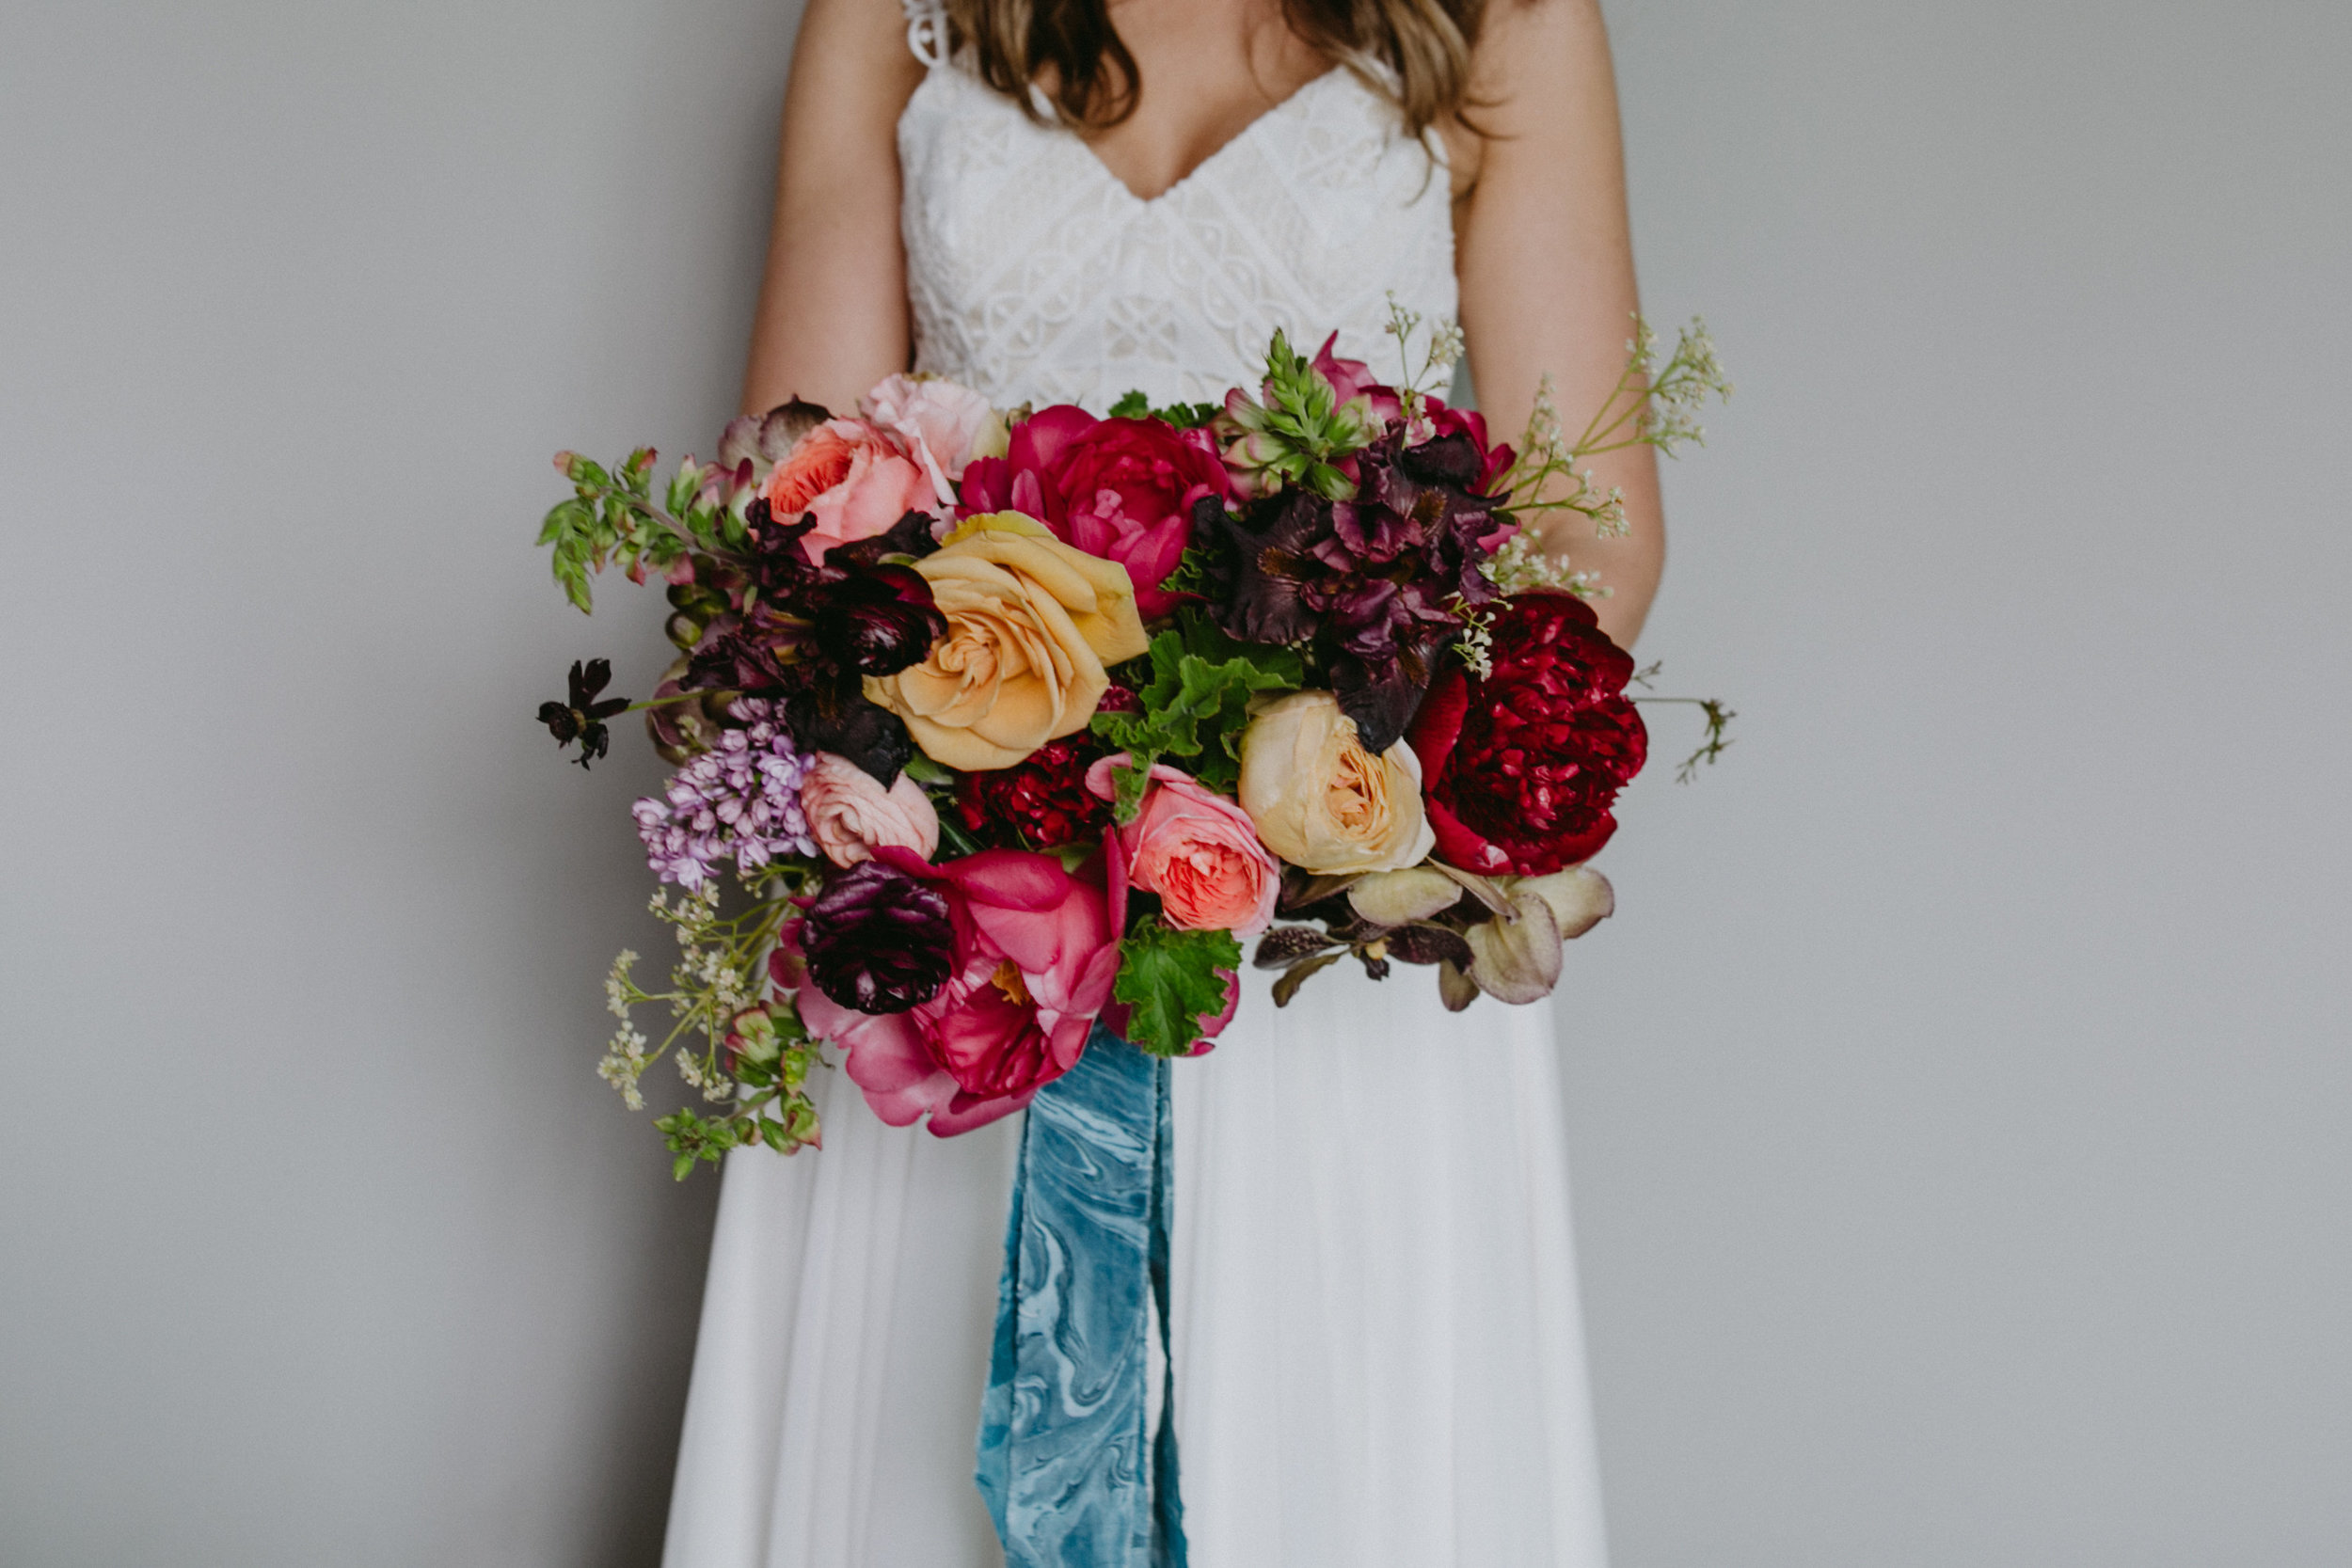 501Union_Brooklyn_Wedding_Photographer_Chellise_Michael_Photography-59.jpg